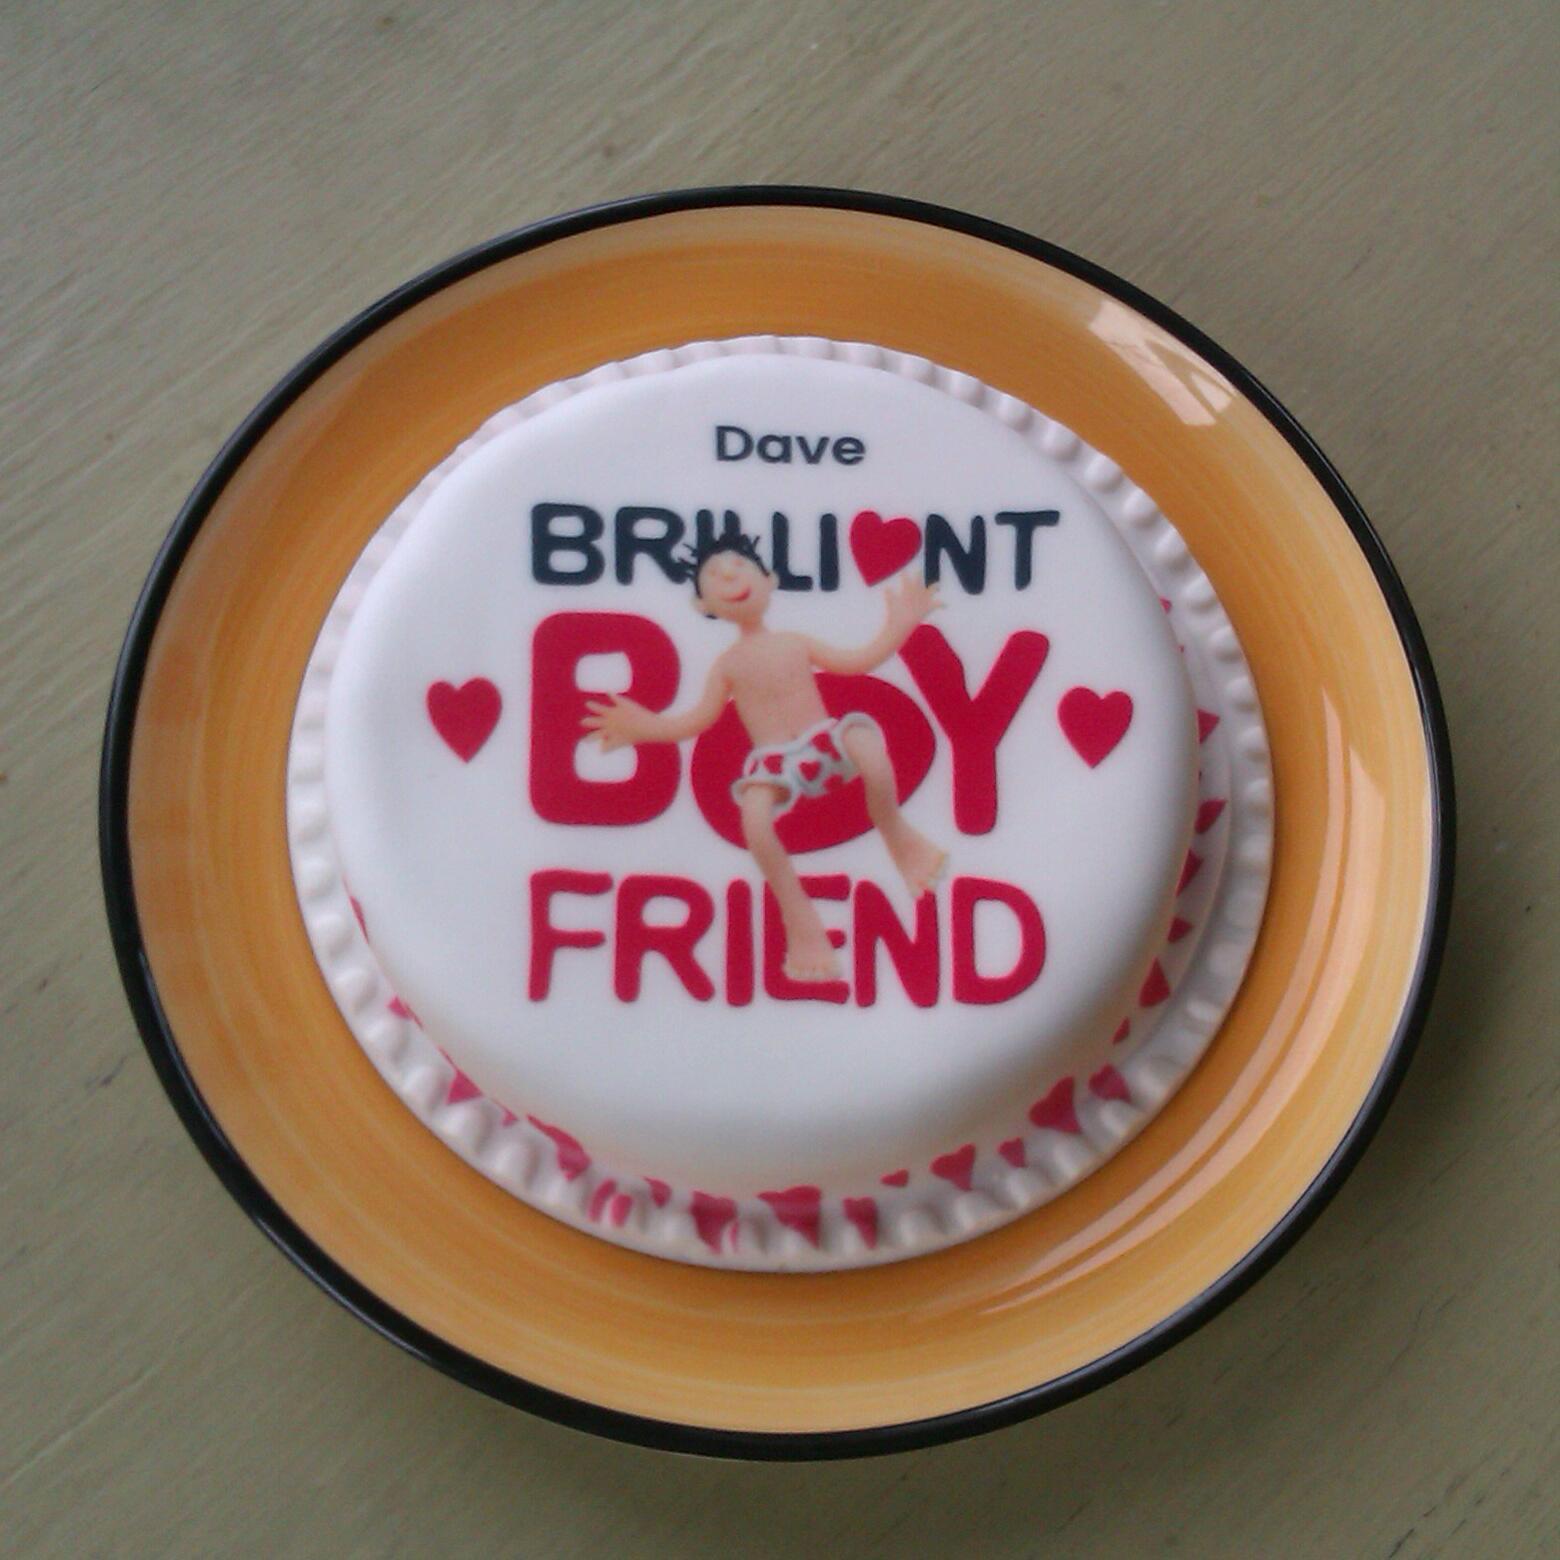 Stephanie Jane Receiving A Brilliant Boyfriend Bakerdays Cake